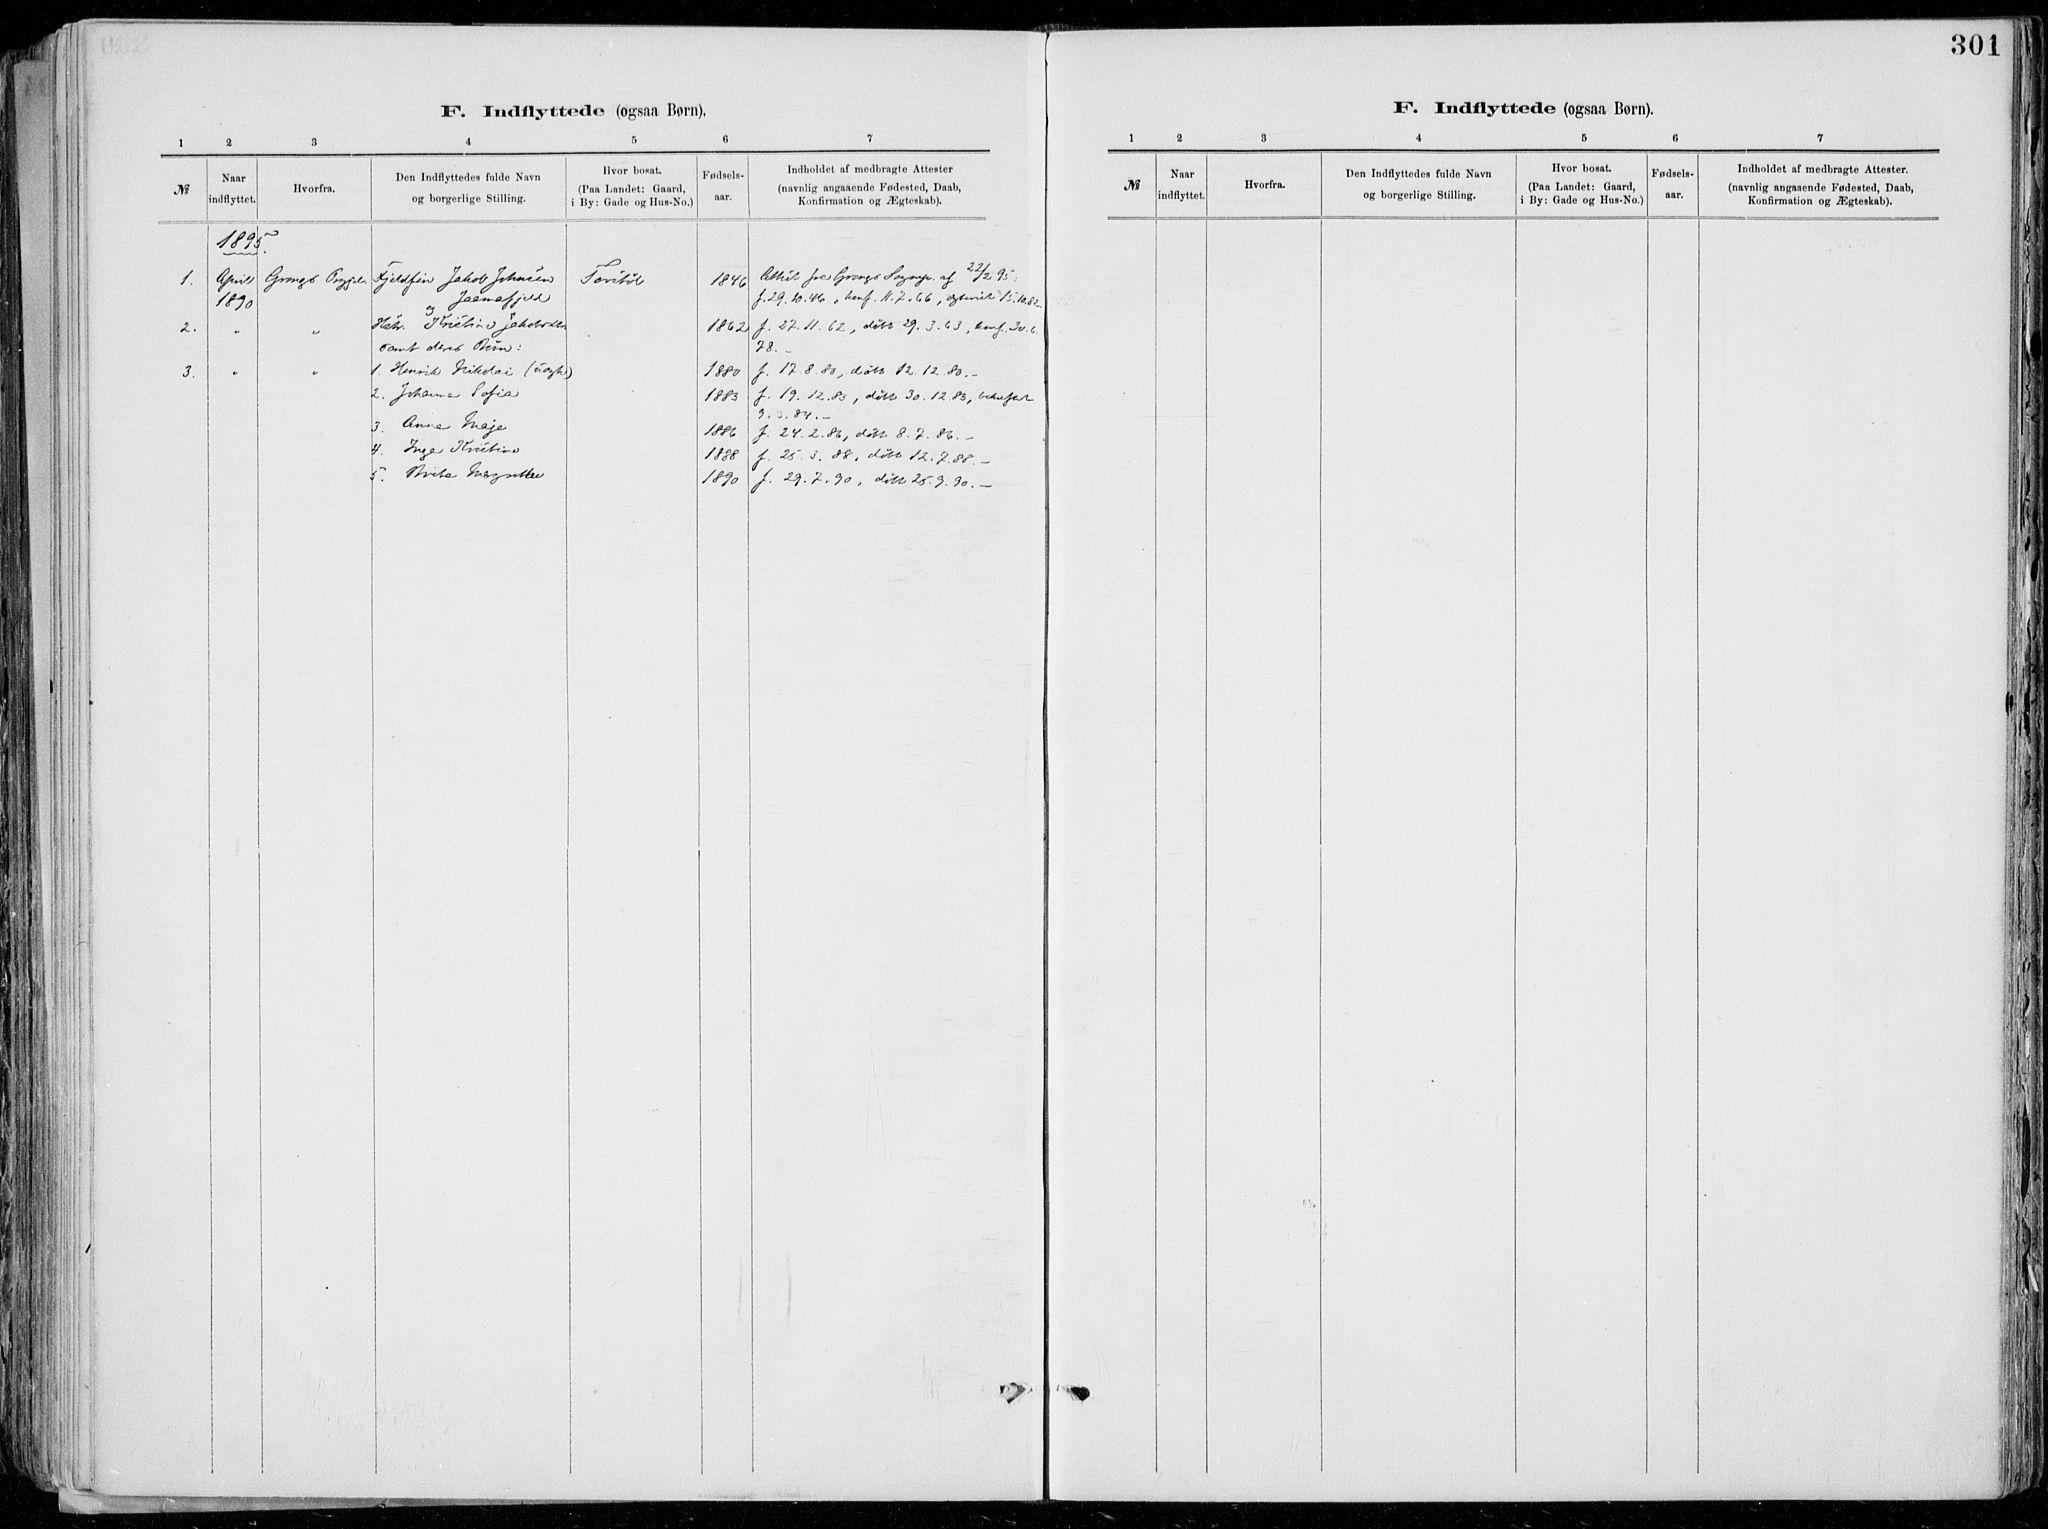 SAKO, Tinn kirkebøker, F/Fa/L0007: Ministerialbok nr. I 7, 1878-1922, s. 301